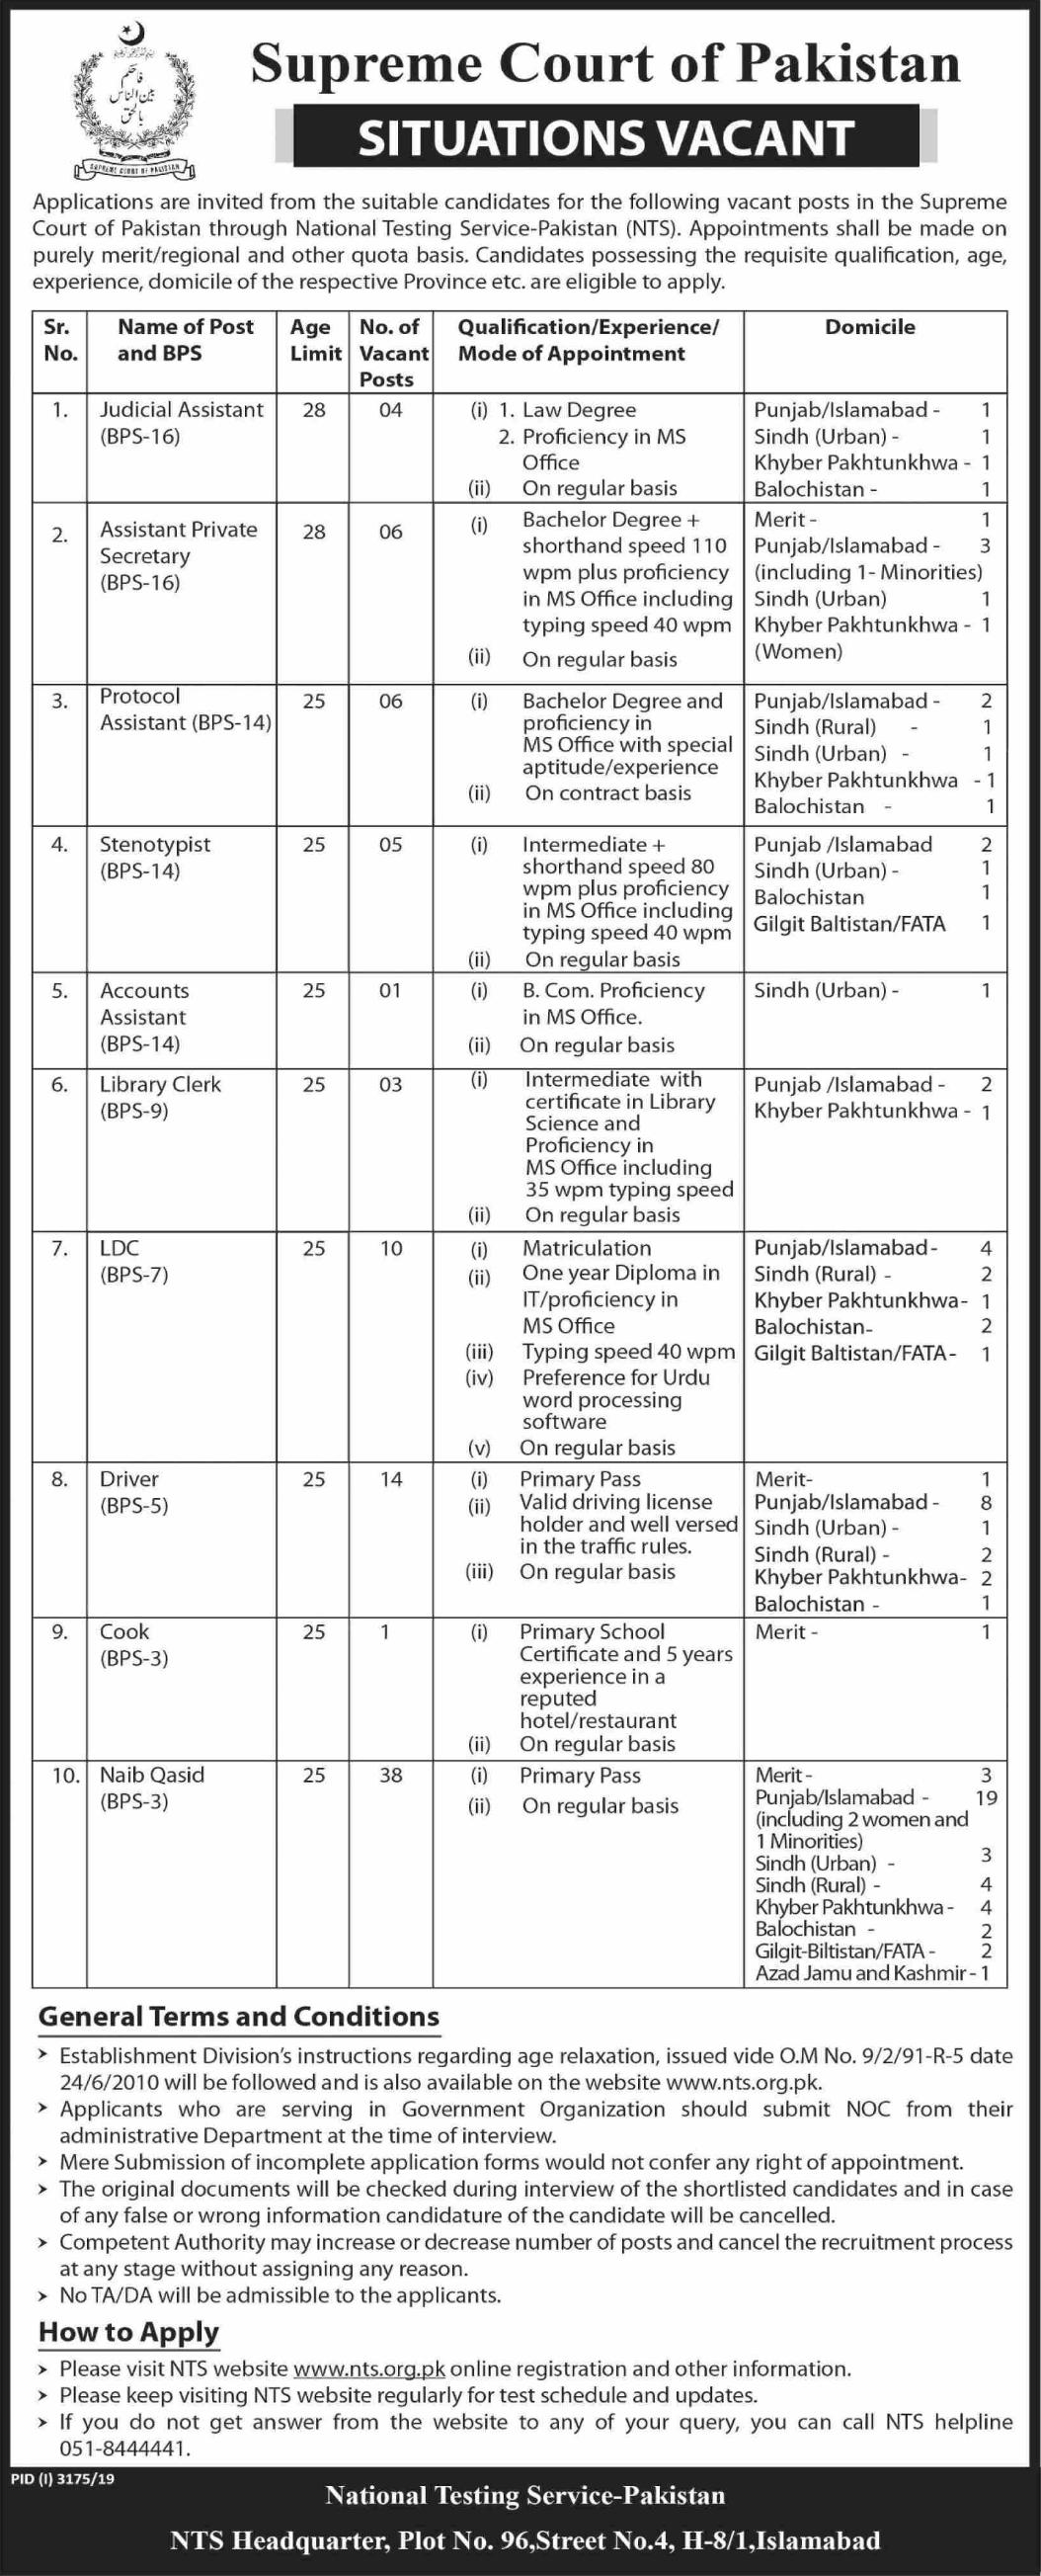 Supreme Court of Pakistan Jobs NTS Answer Keys Result